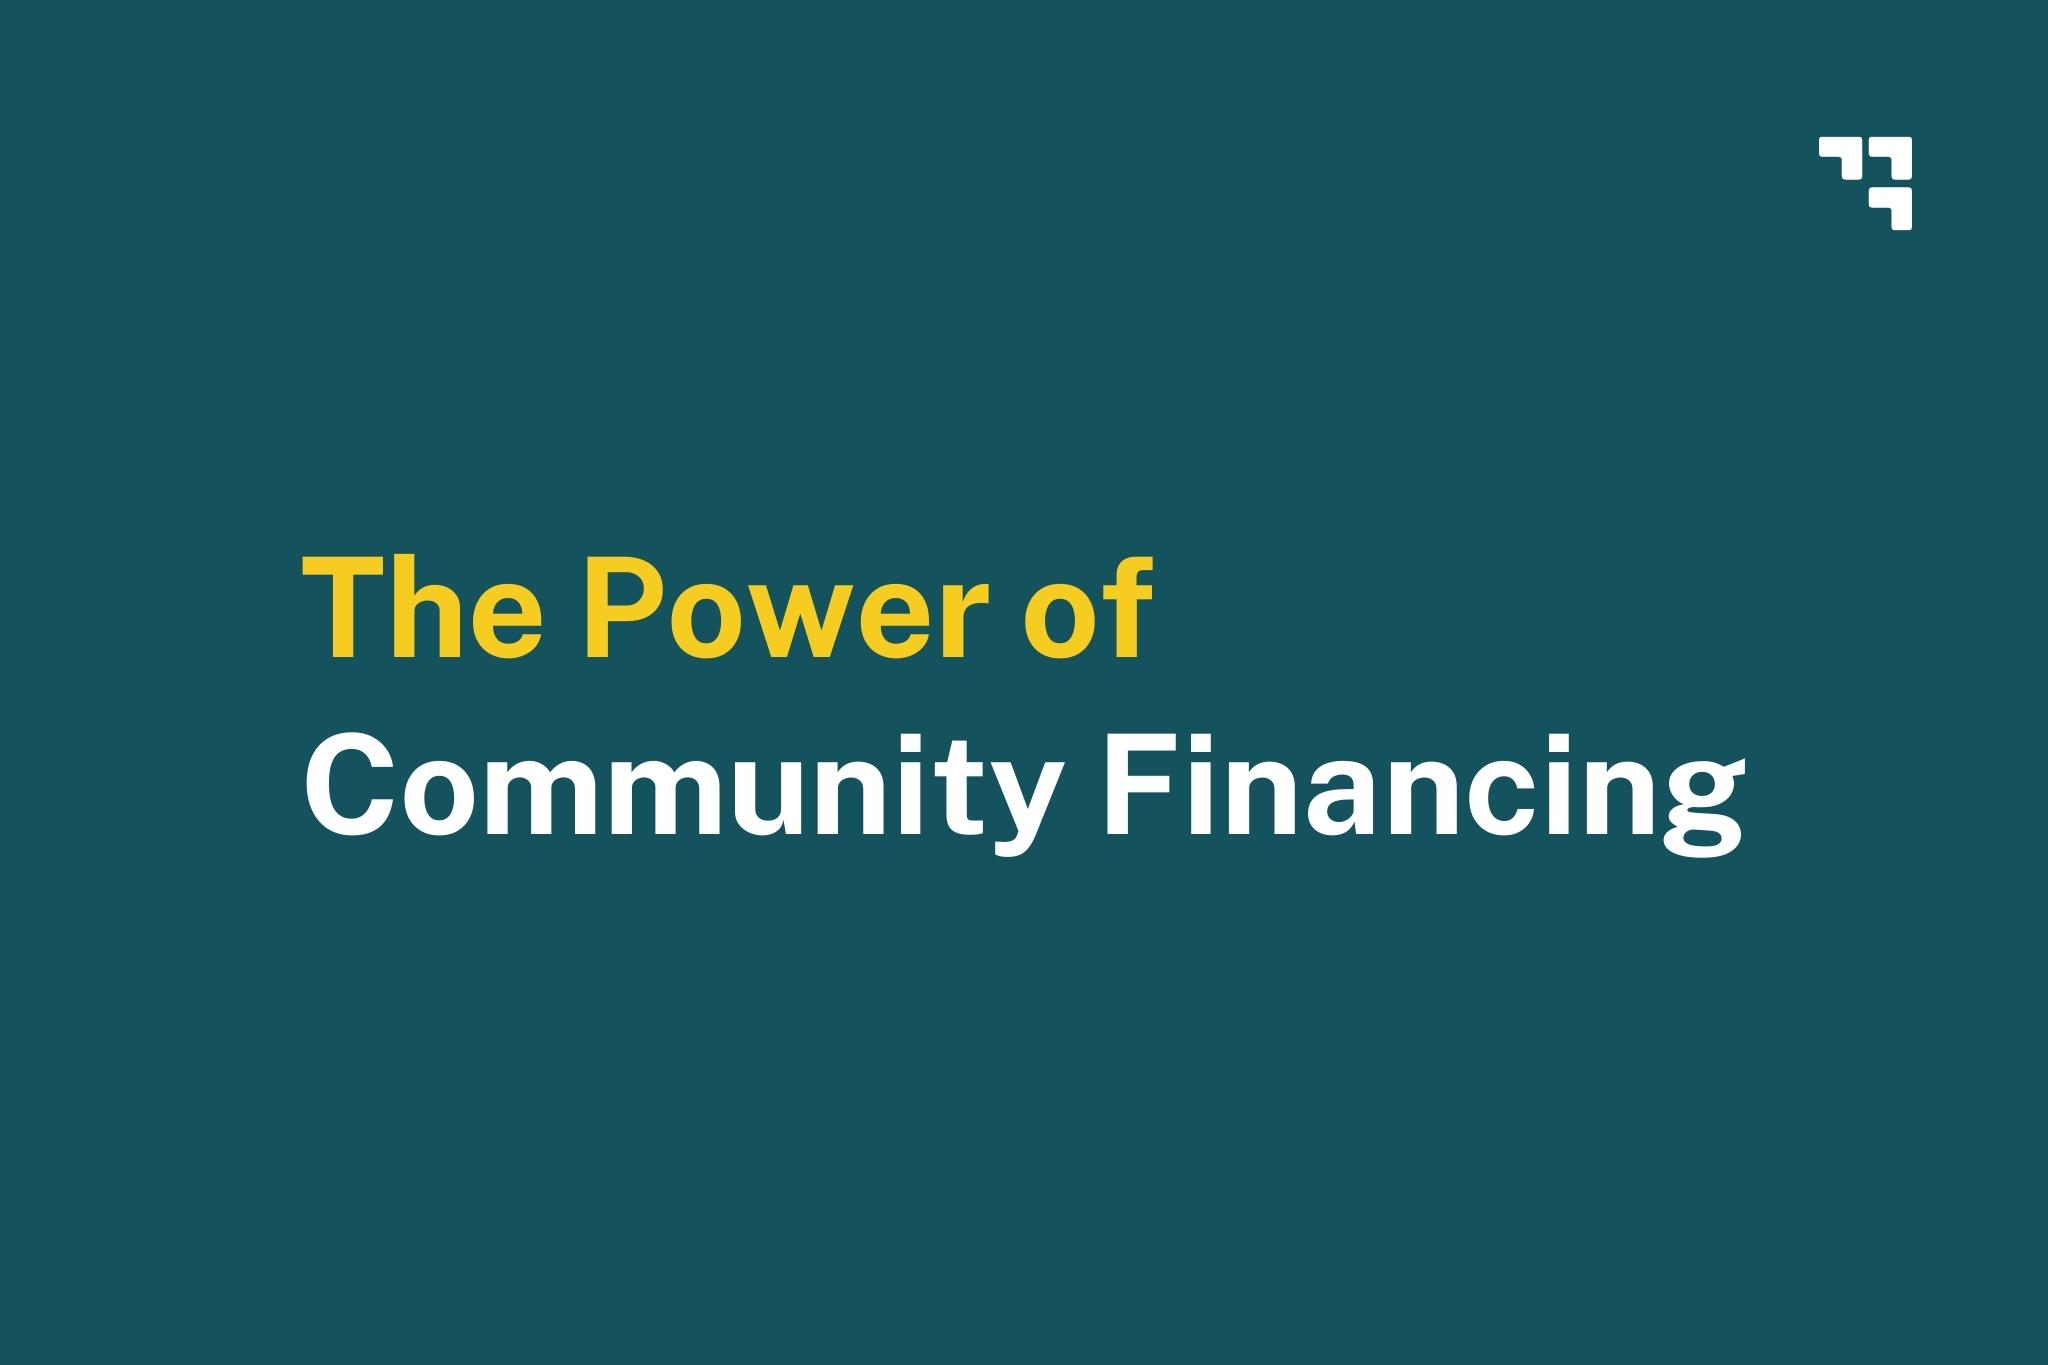 Power of Community Financing